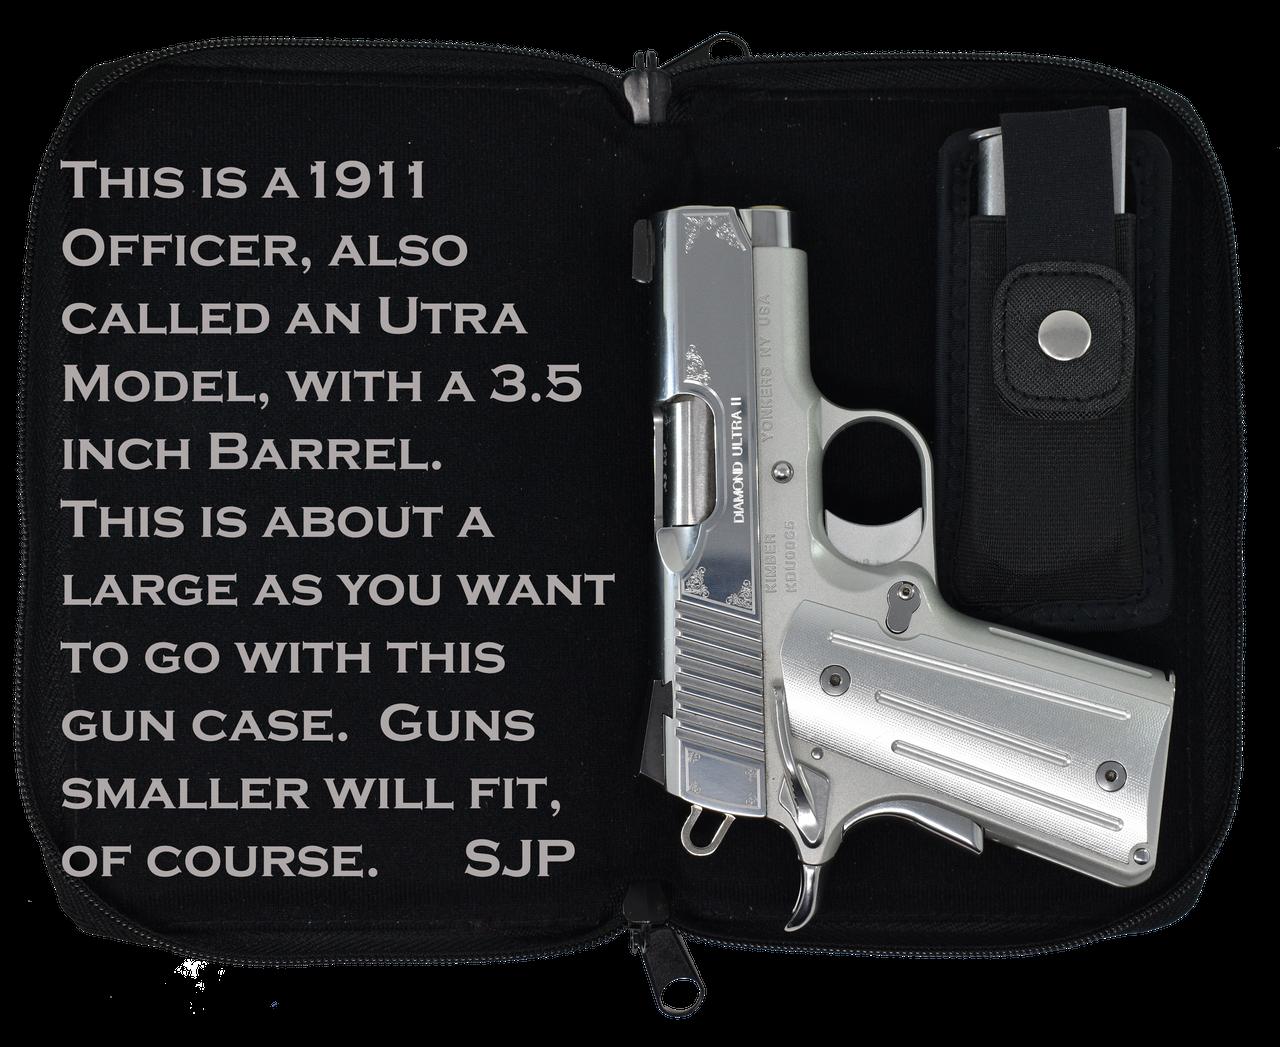 Garrison Grip Quality Leather CCW Bible Gun Case for Compact and Subcompact Guns (GTSN) TURQ